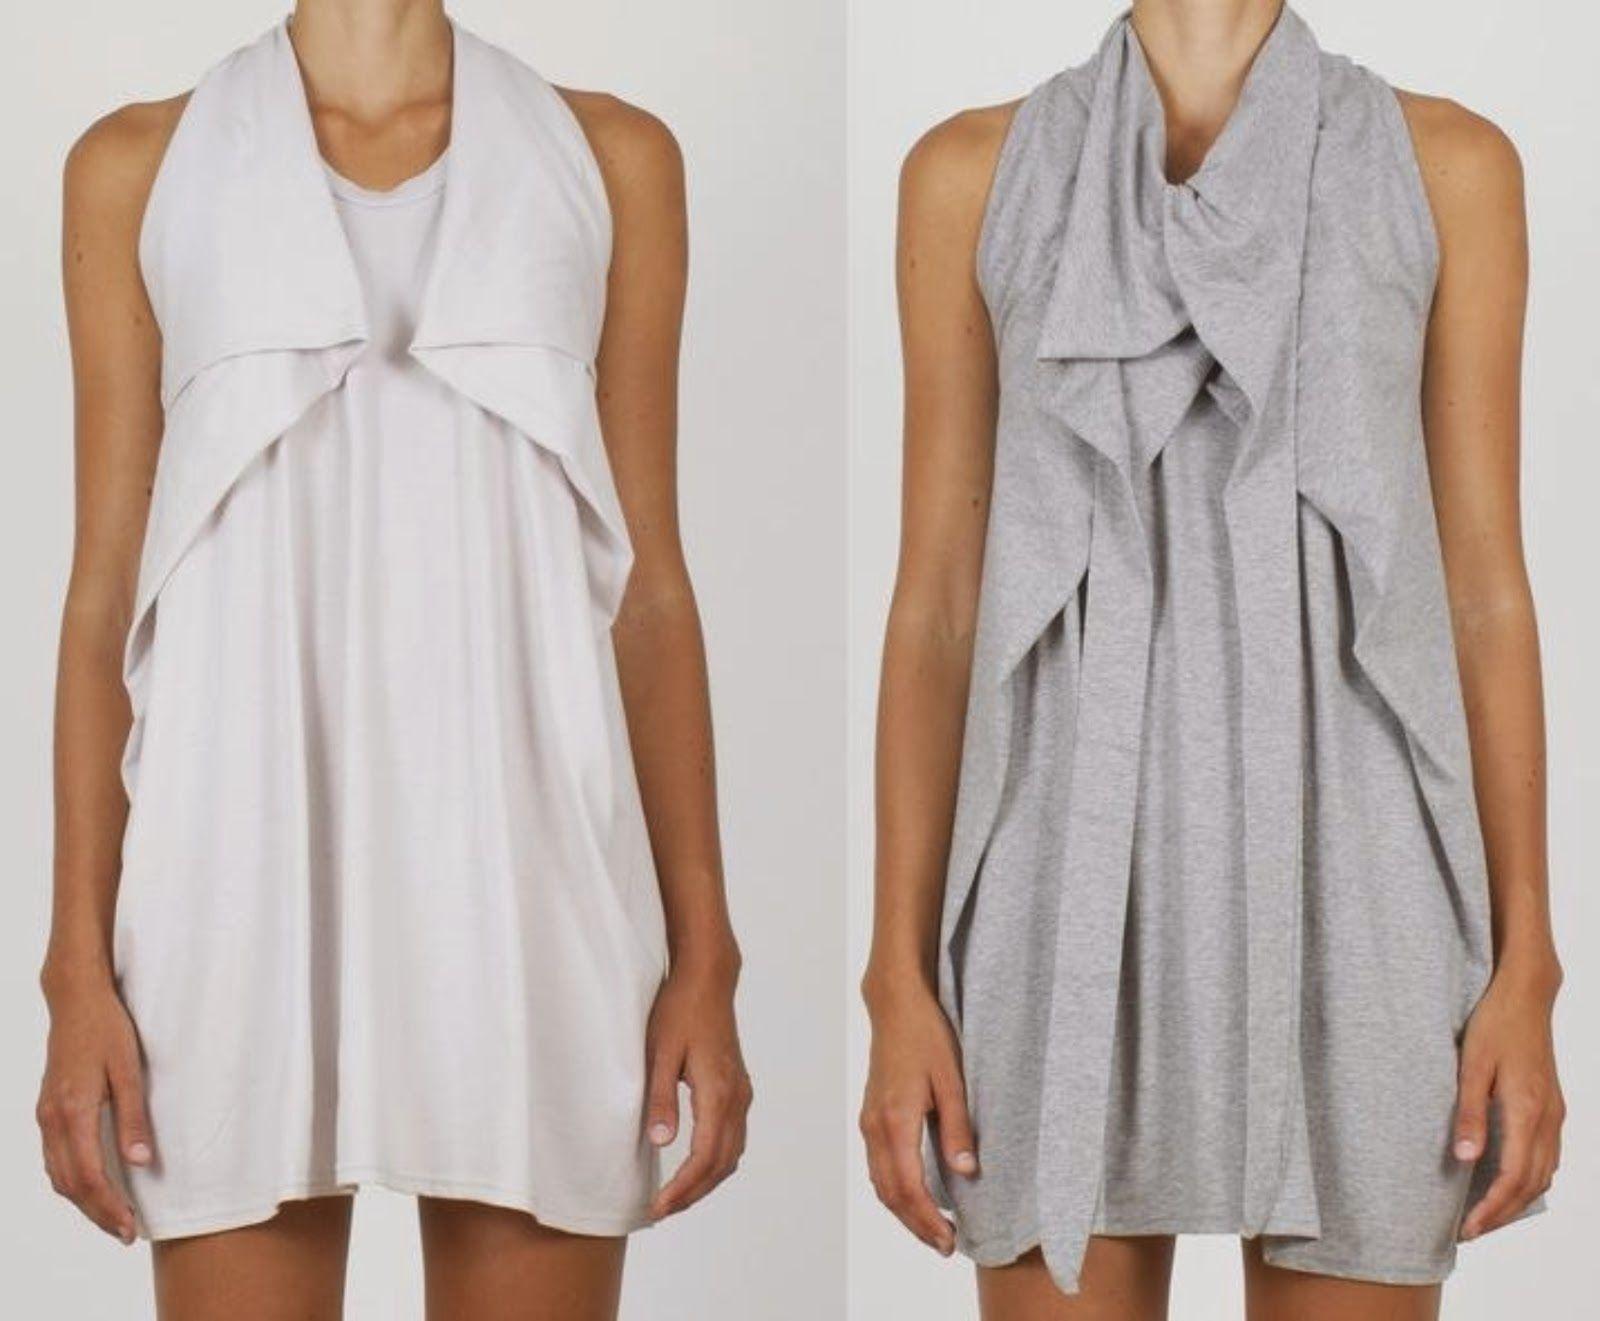 Diy blog about sewing textil printing u graphics design and stuff